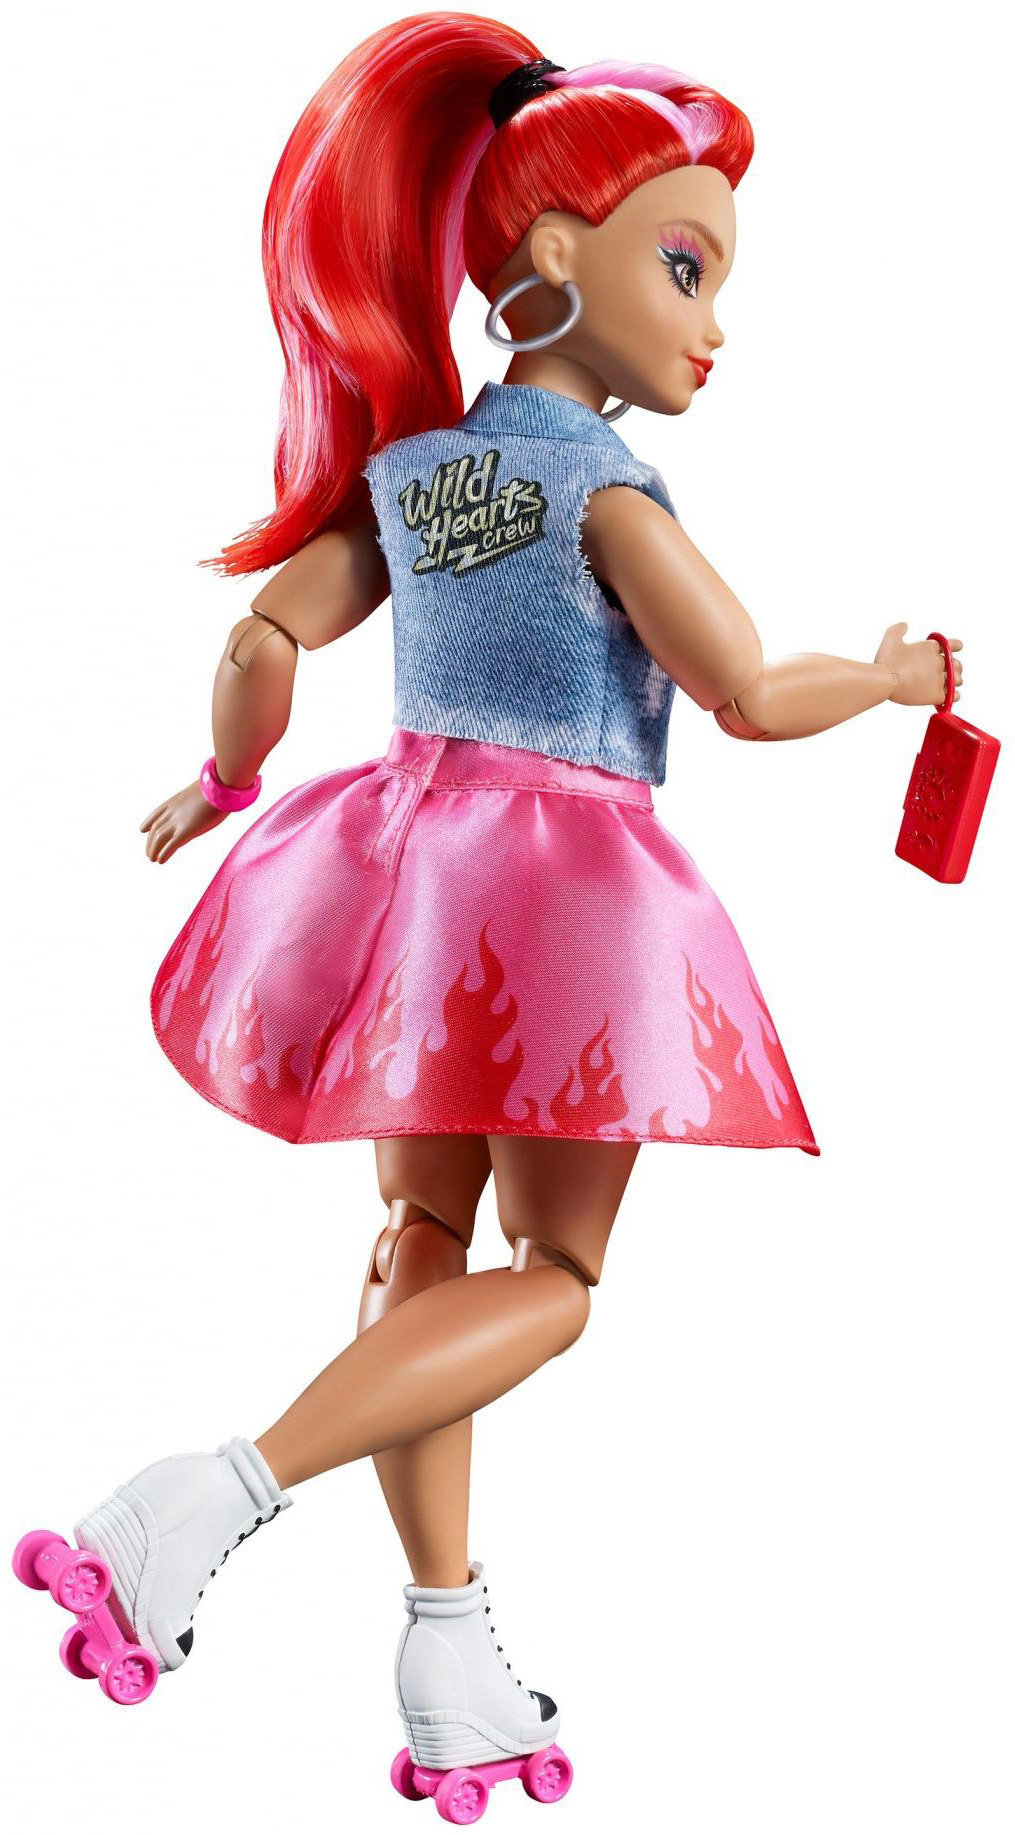 Wild Hearts Crew Mattel By Cimmi Cumes Mills At